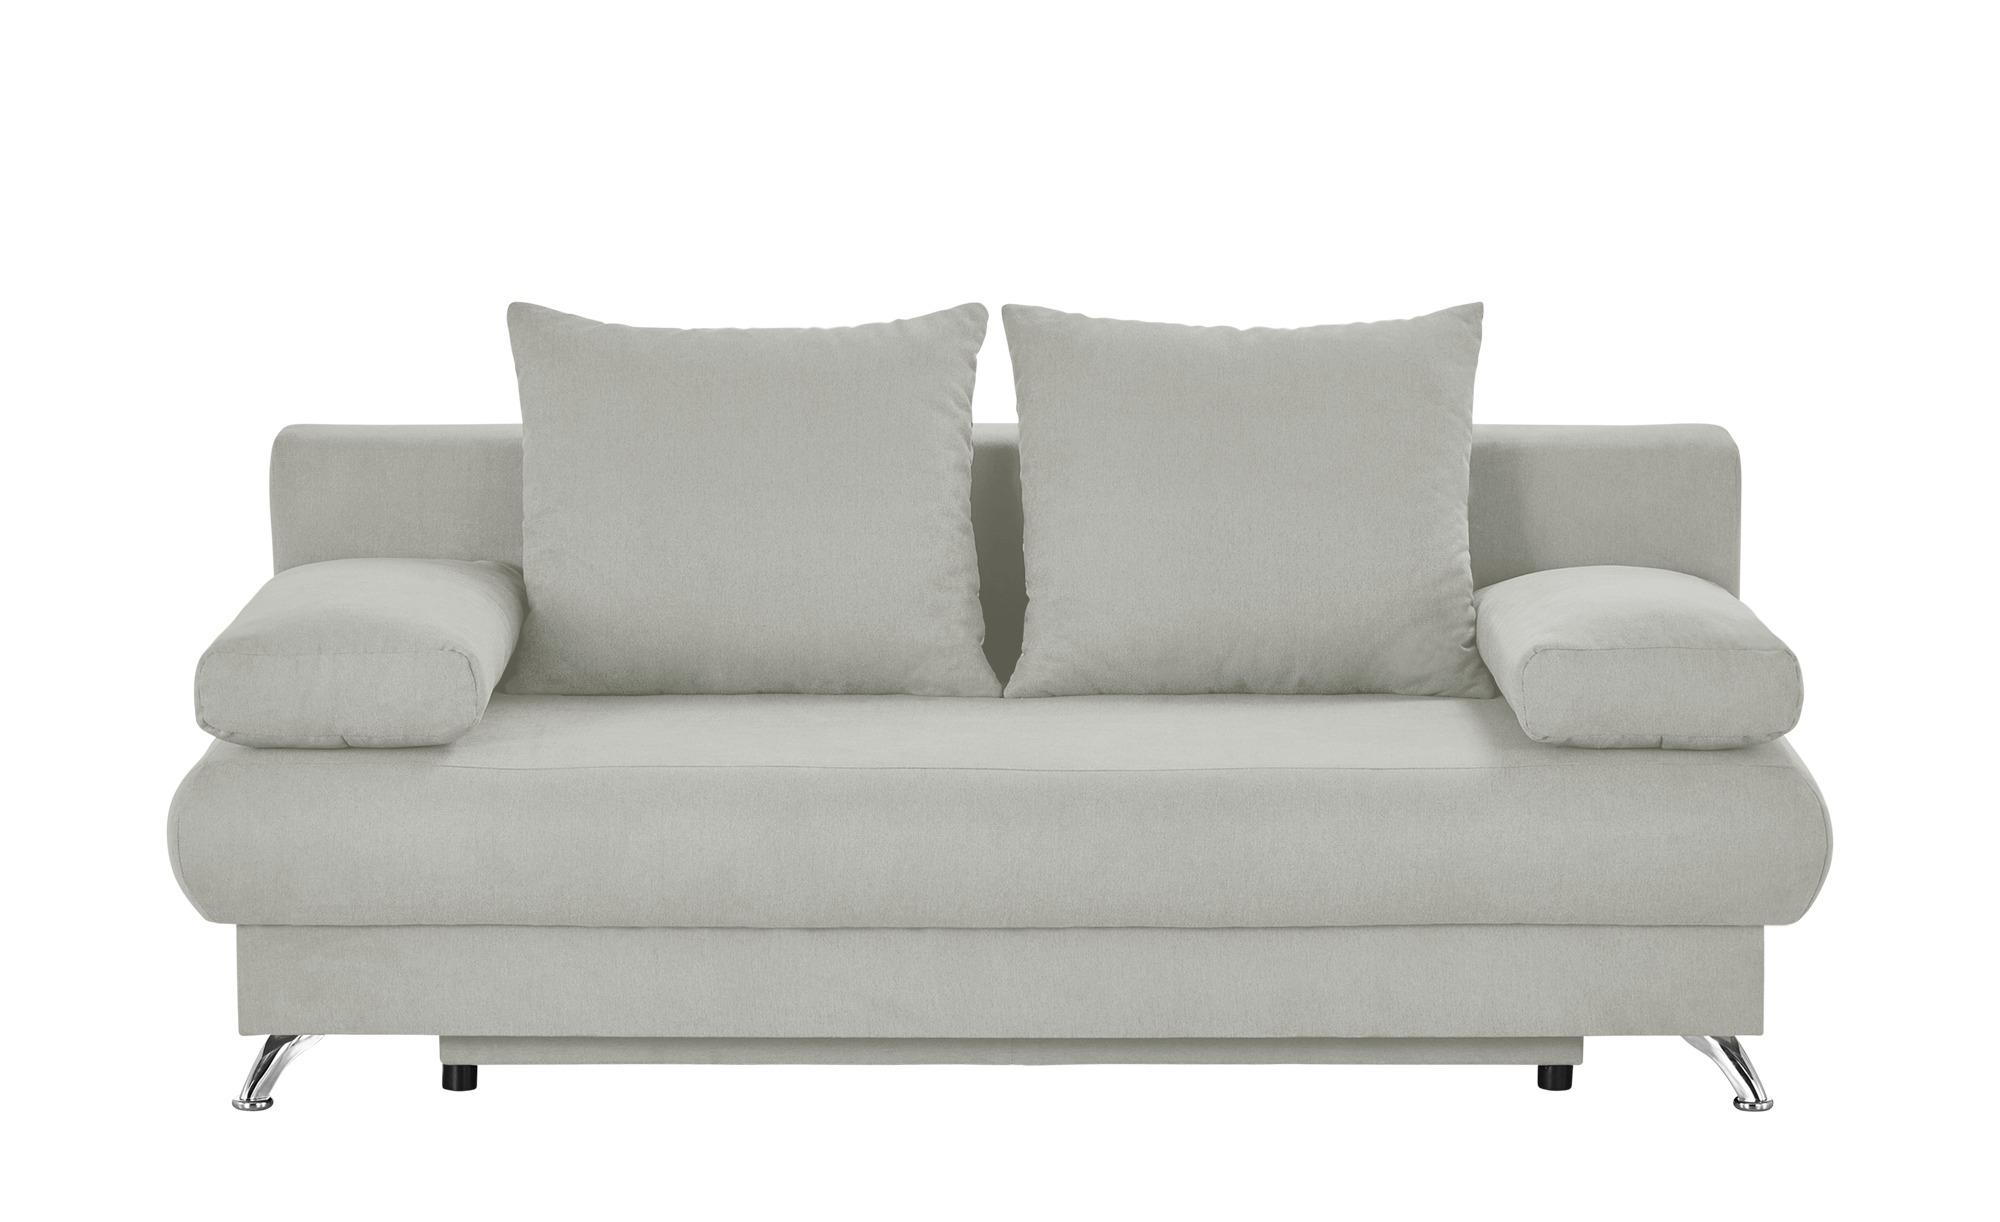 Schlafsofa grau - Flachgewebe Viola ¦ grau ¦ Maße (cm): B: 203 H: 72 T: 93 Polstermöbel > Sofas > 2-Sitzer - Höffner